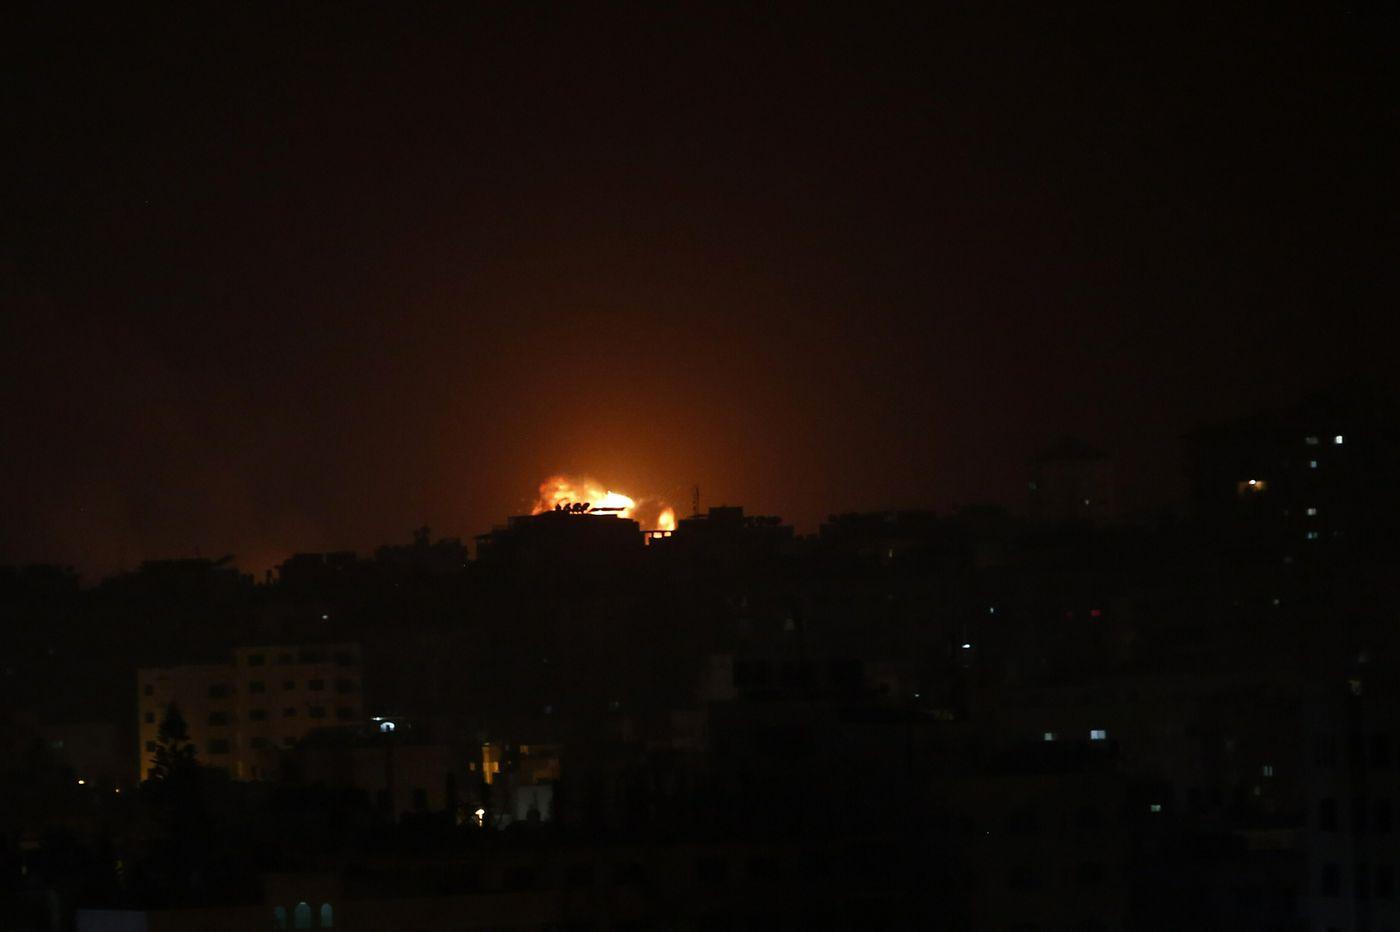 Israel says it struck 100 Hamas targets after rocket attack